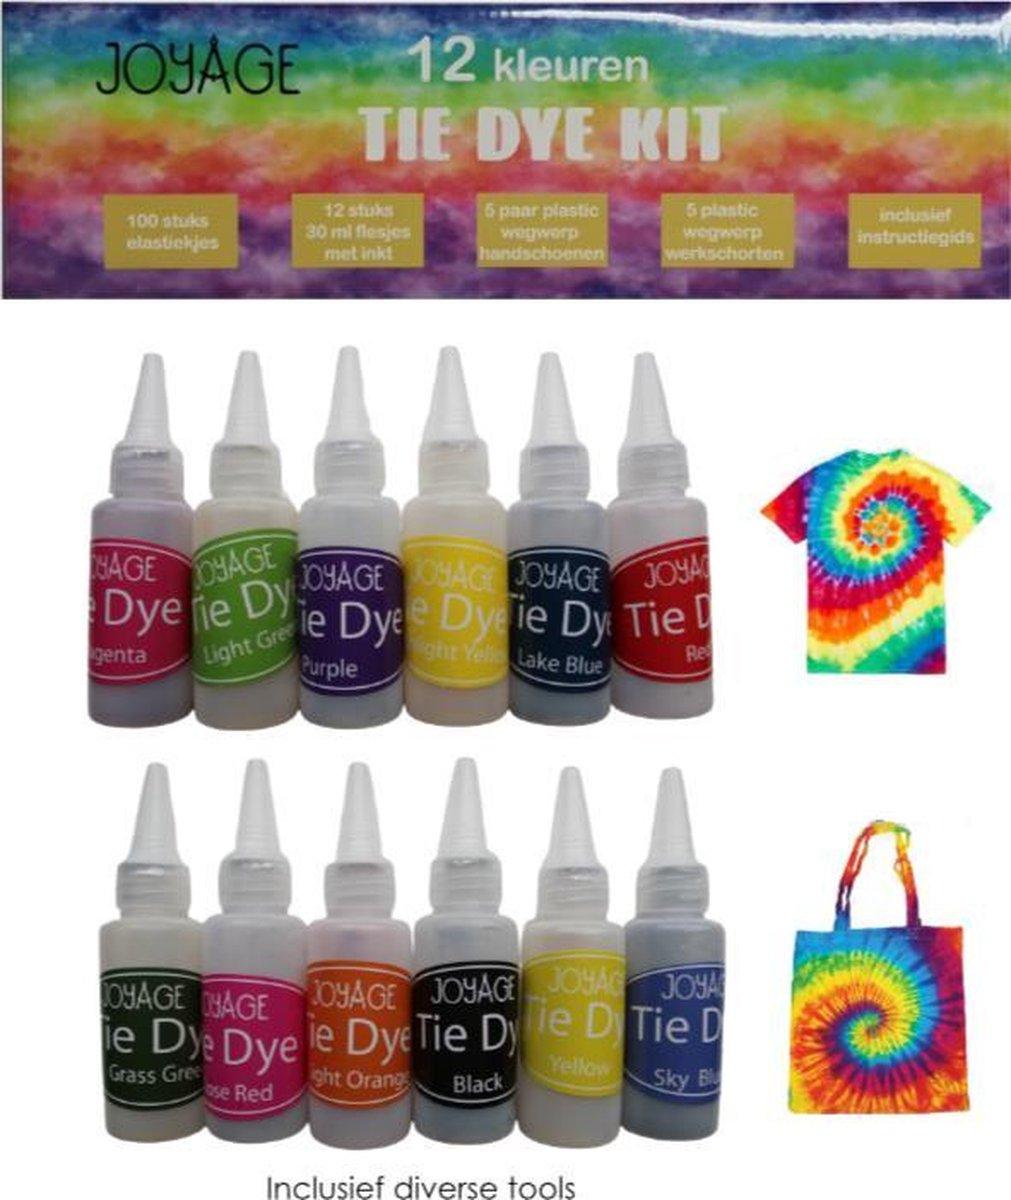 Tie Dye Kit Verf - 12 kleuren - Tie dye verf set - Tie dye set - Batik Verf Paket - Wasmachinetextie